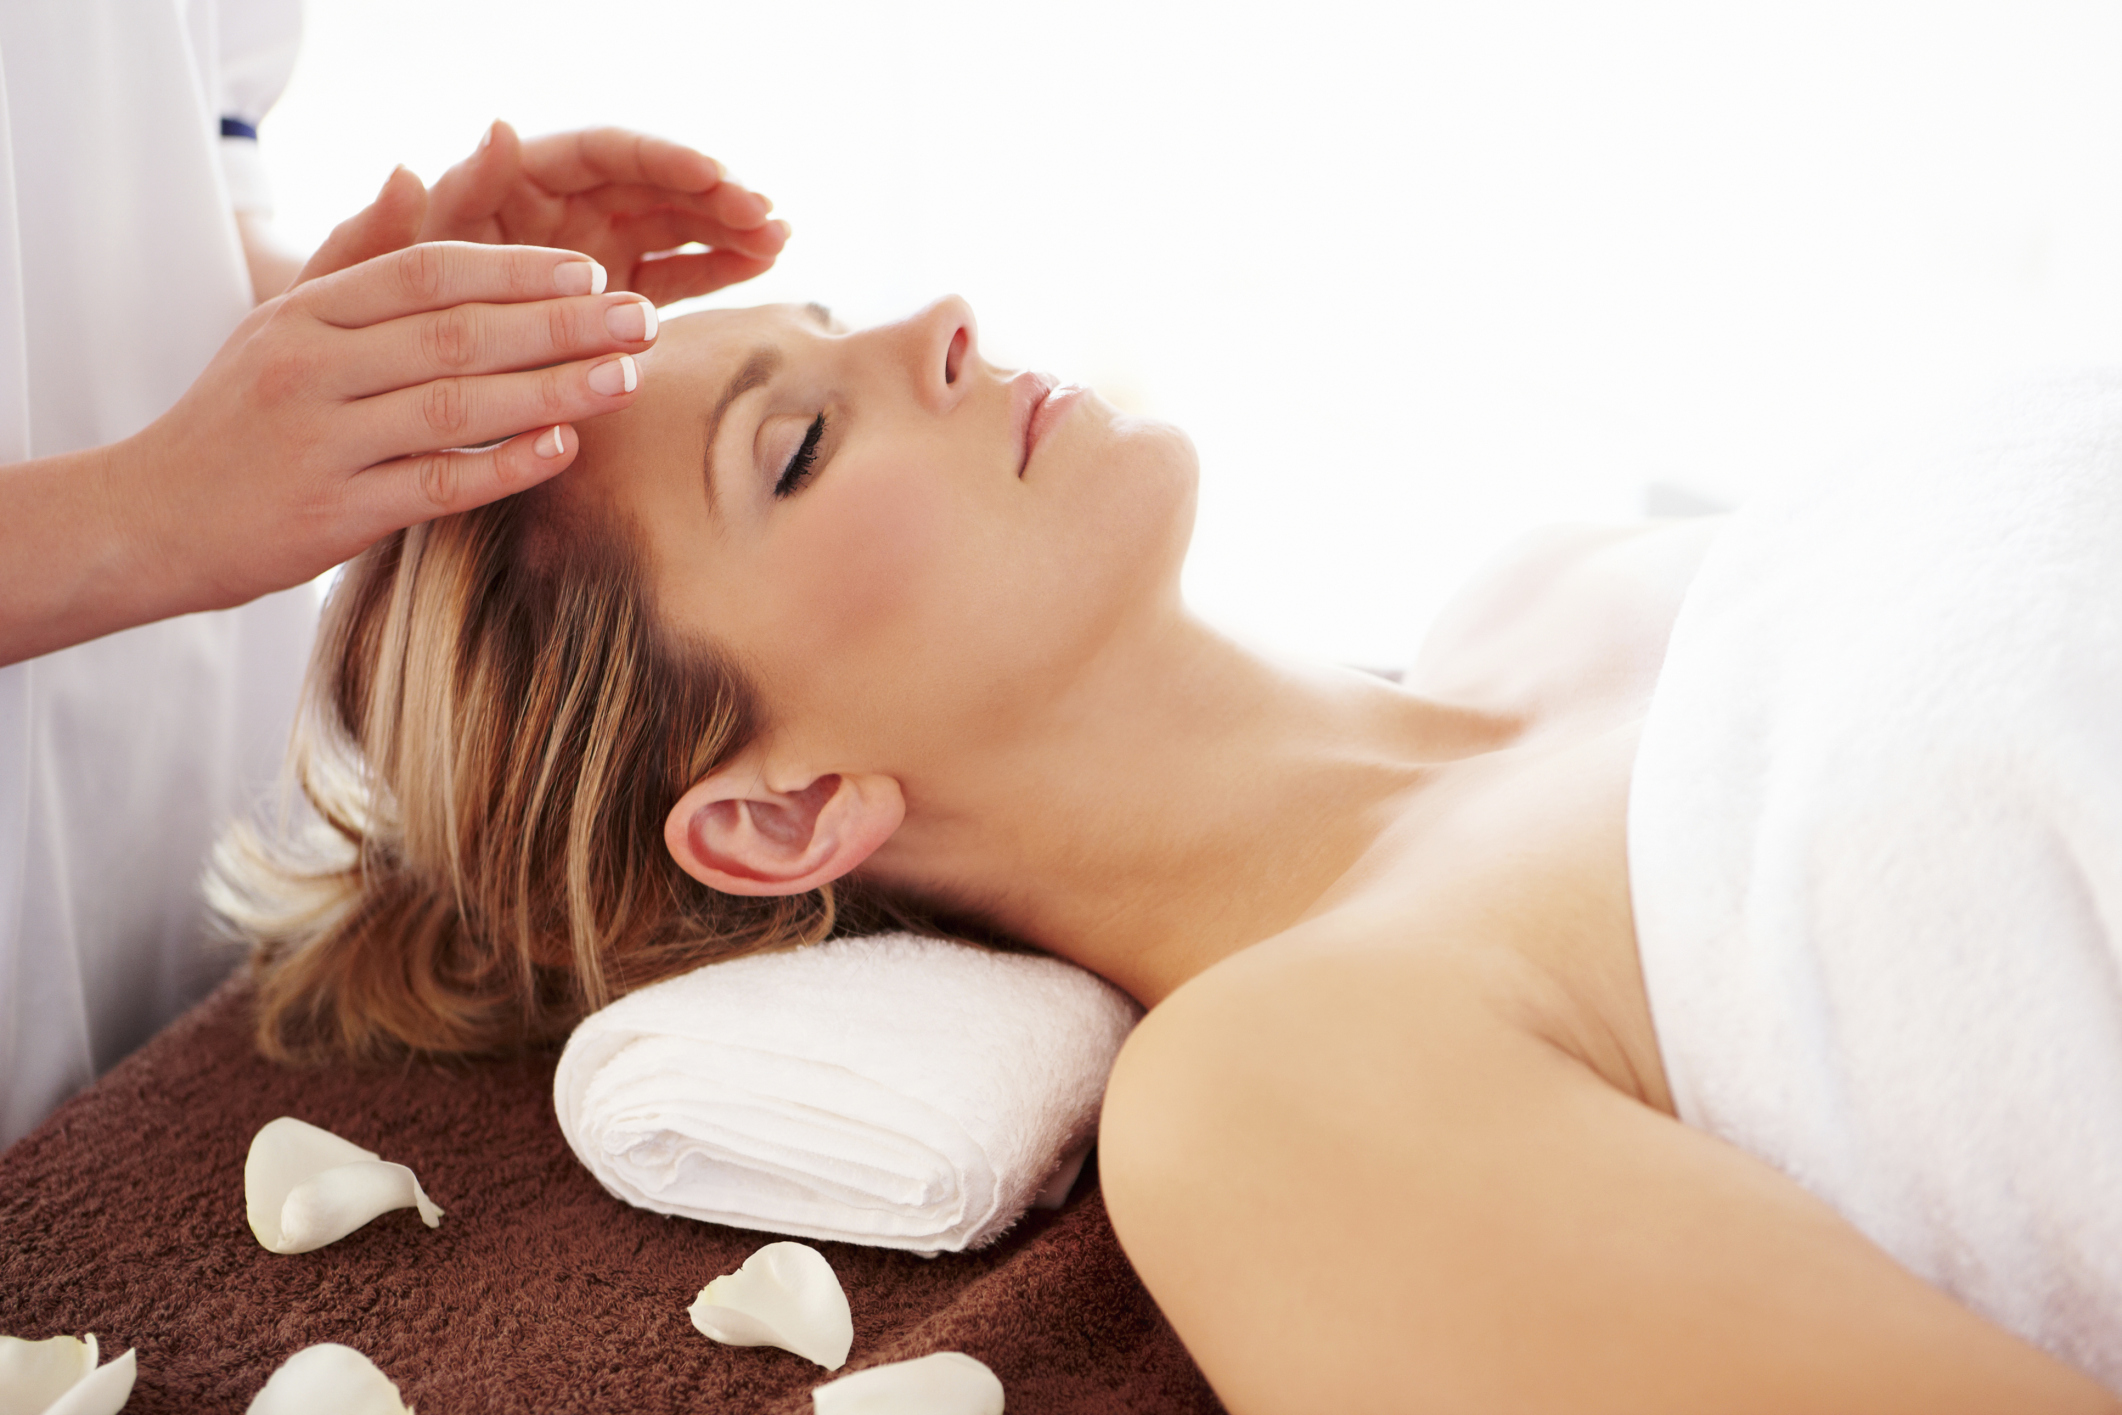 Woman Getting a Reiki treatment